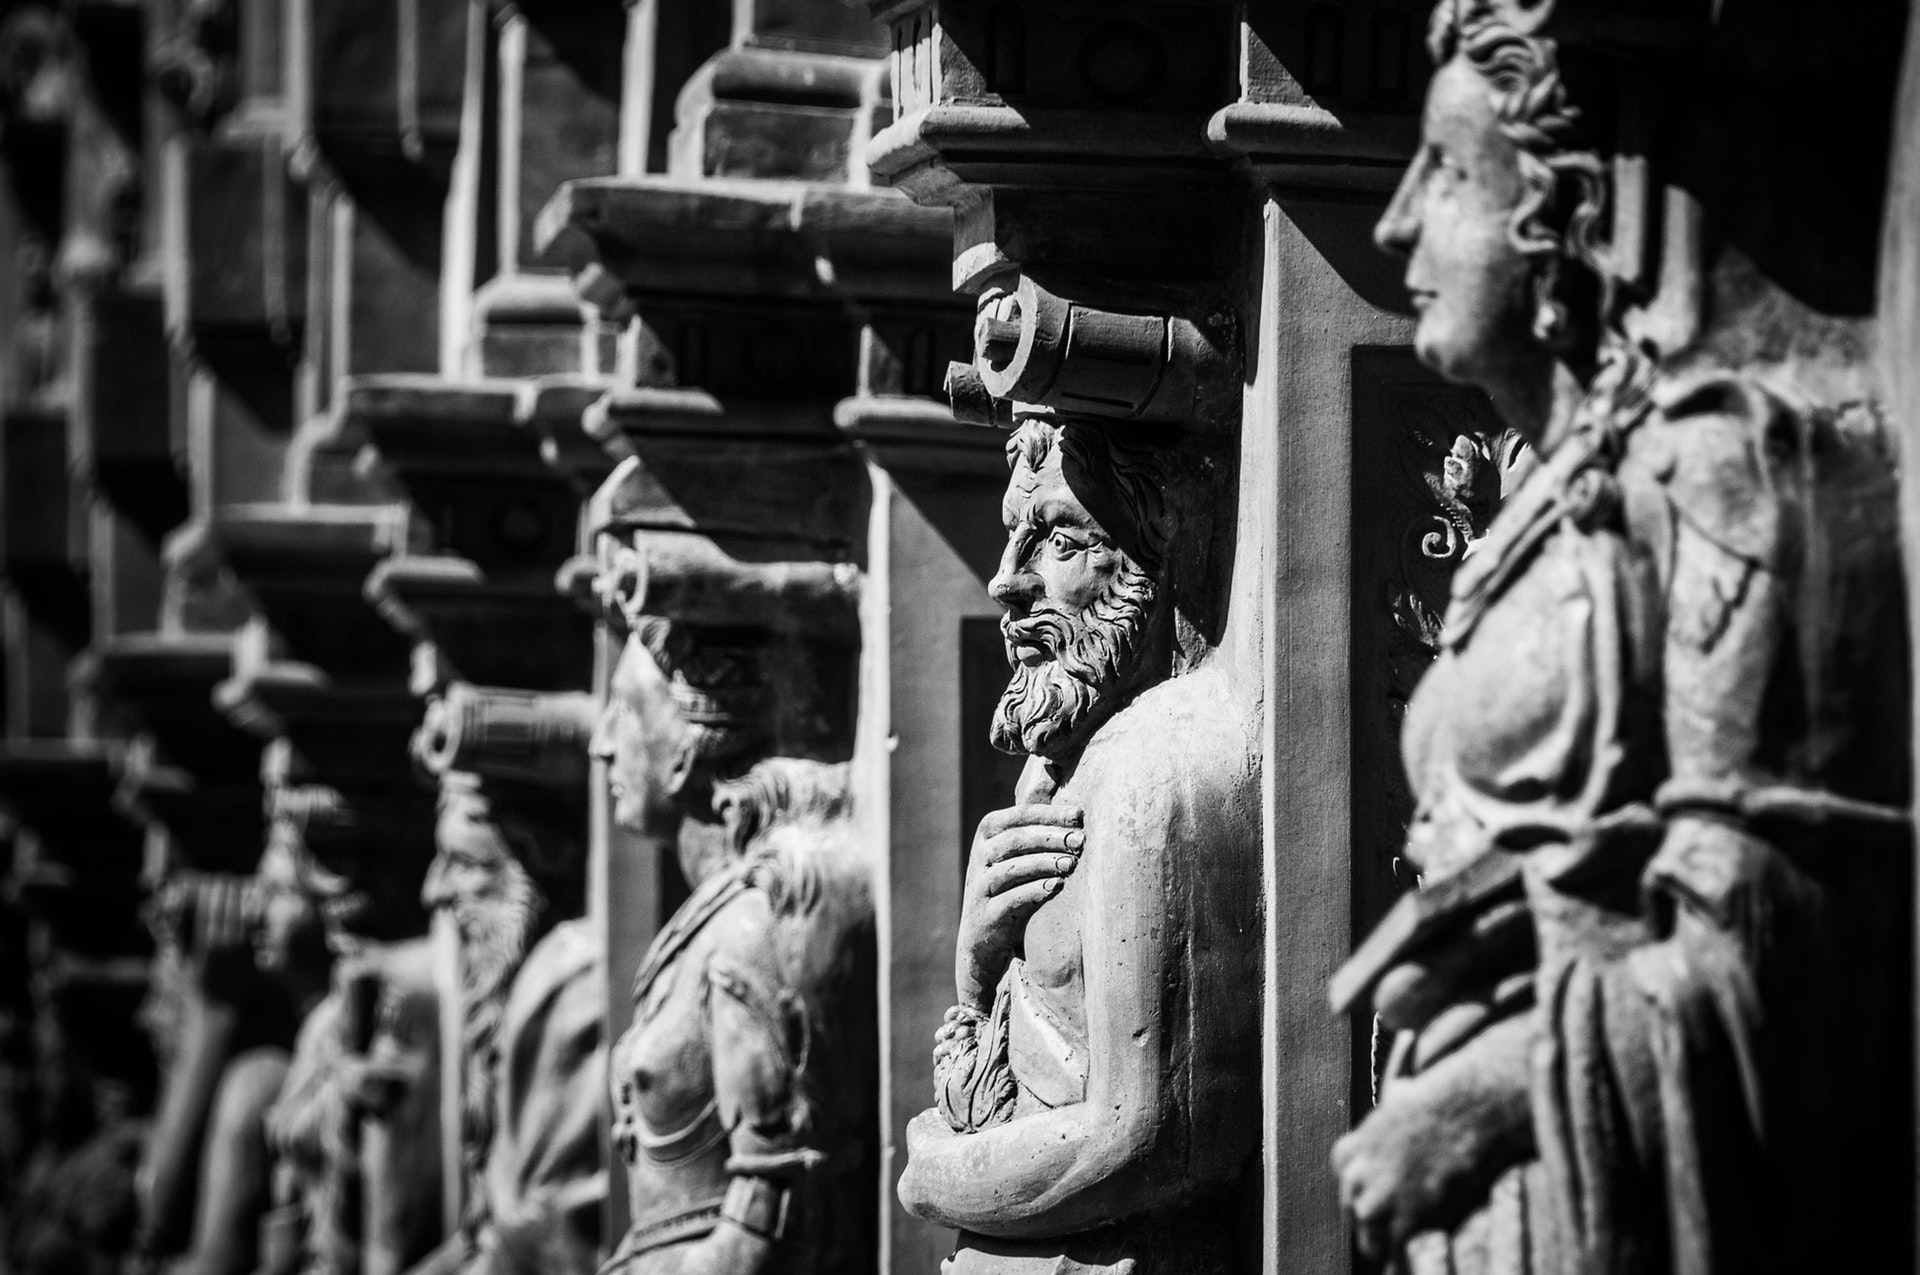 Varpaisjärven seurakunta ja sen historia